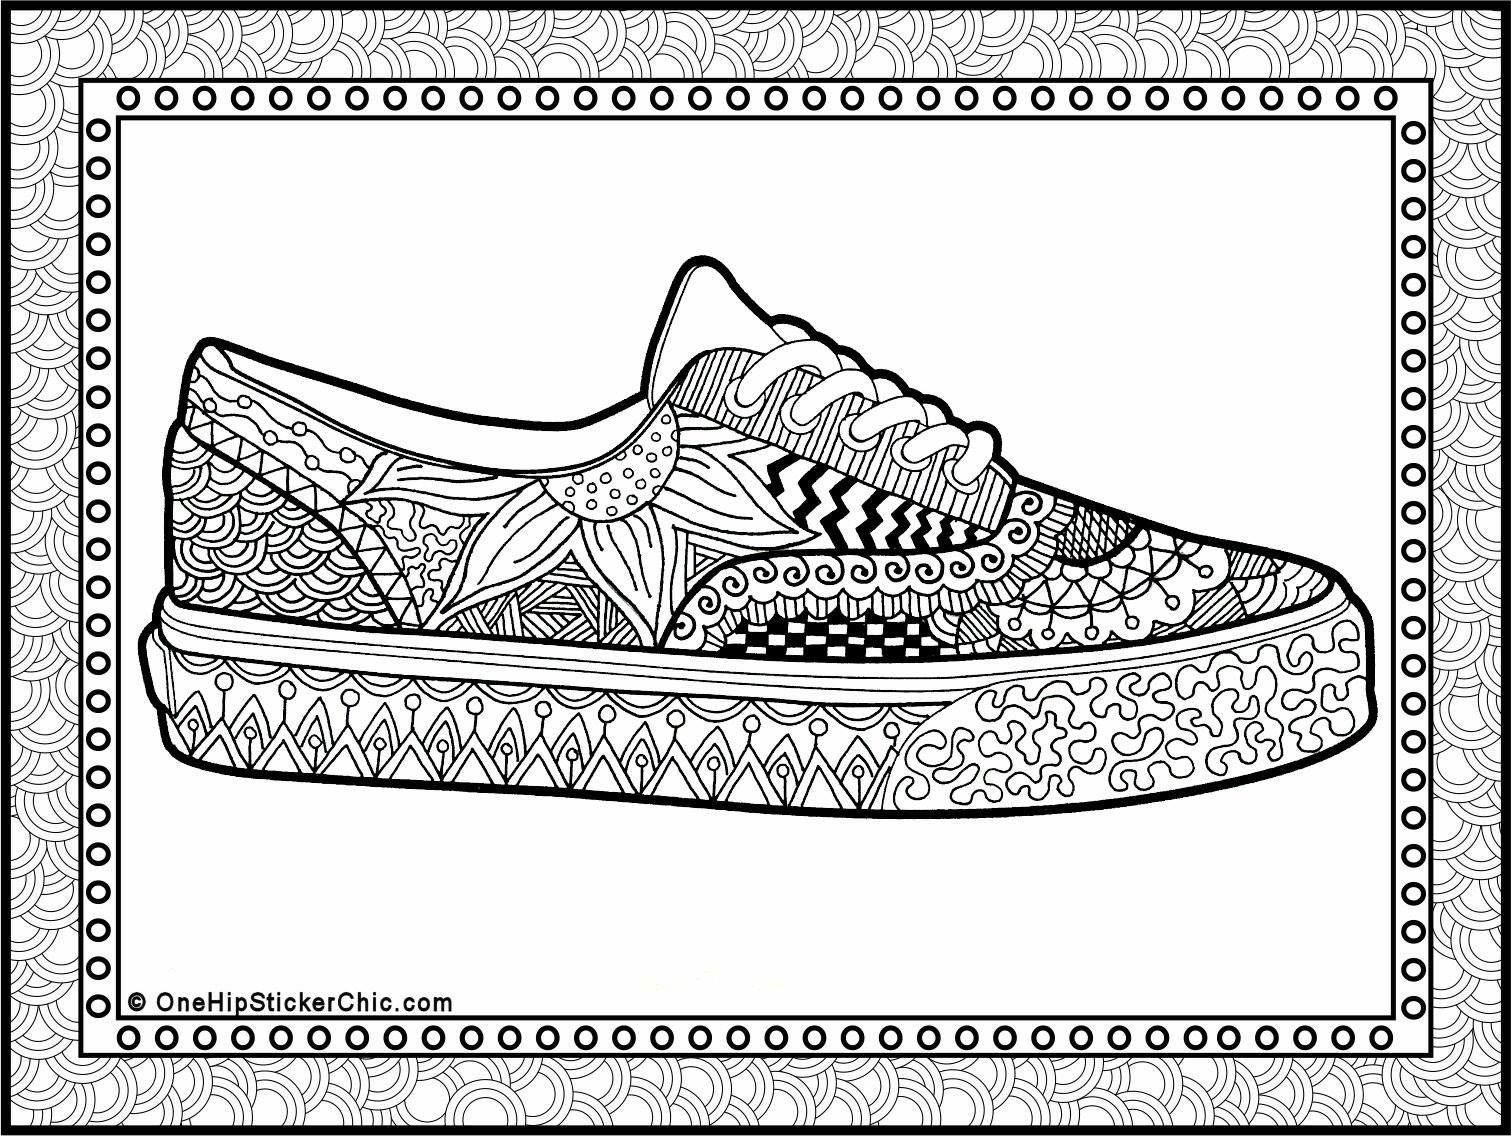 The sneaker coloring book pdf - Zentangle Jogger